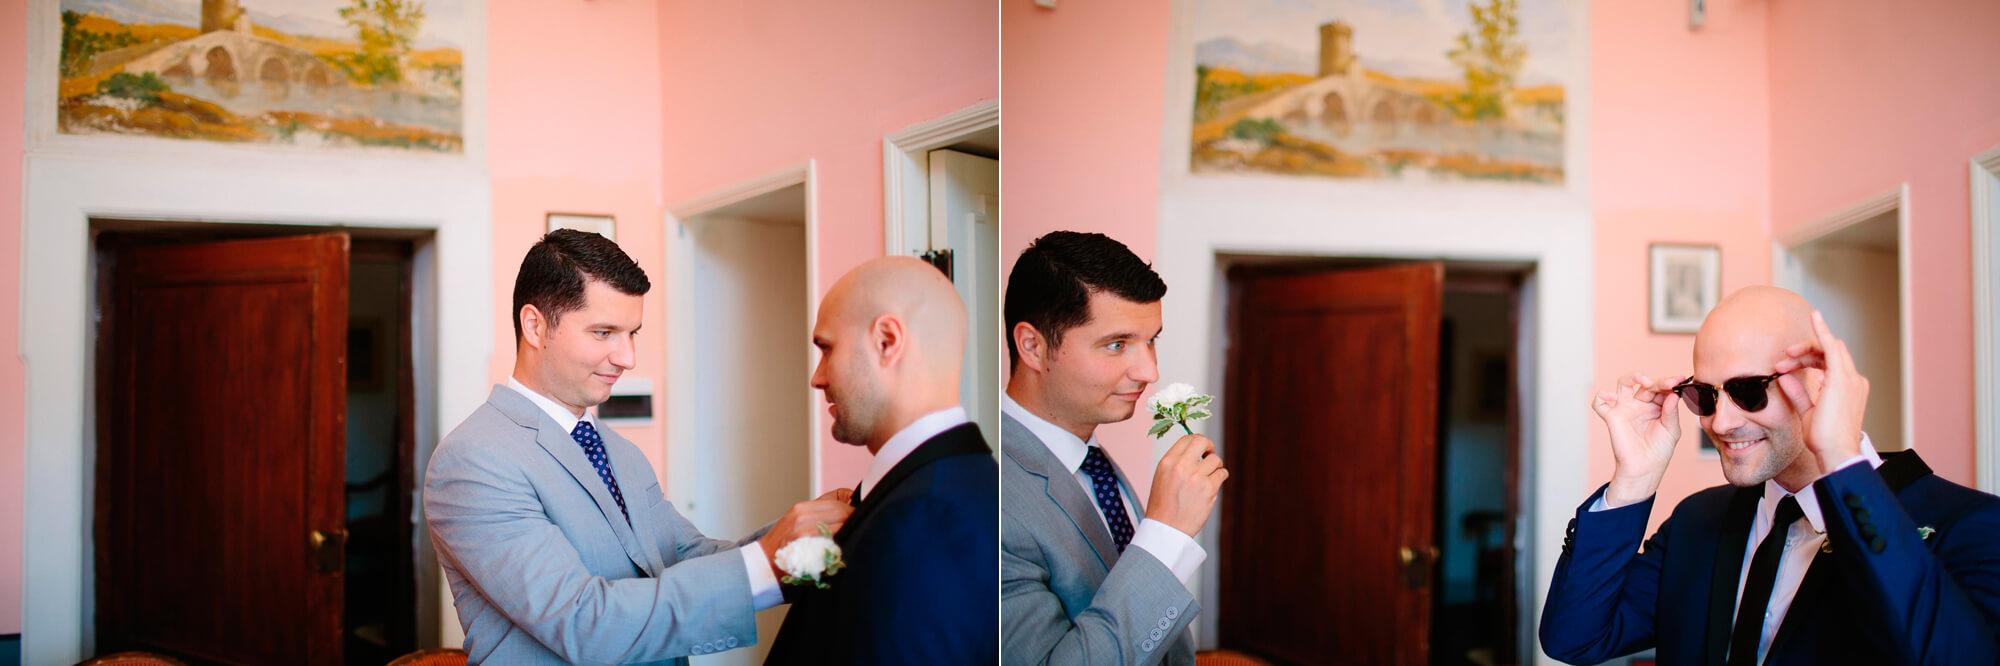 030-sorrento-wedding-photographer.jpg